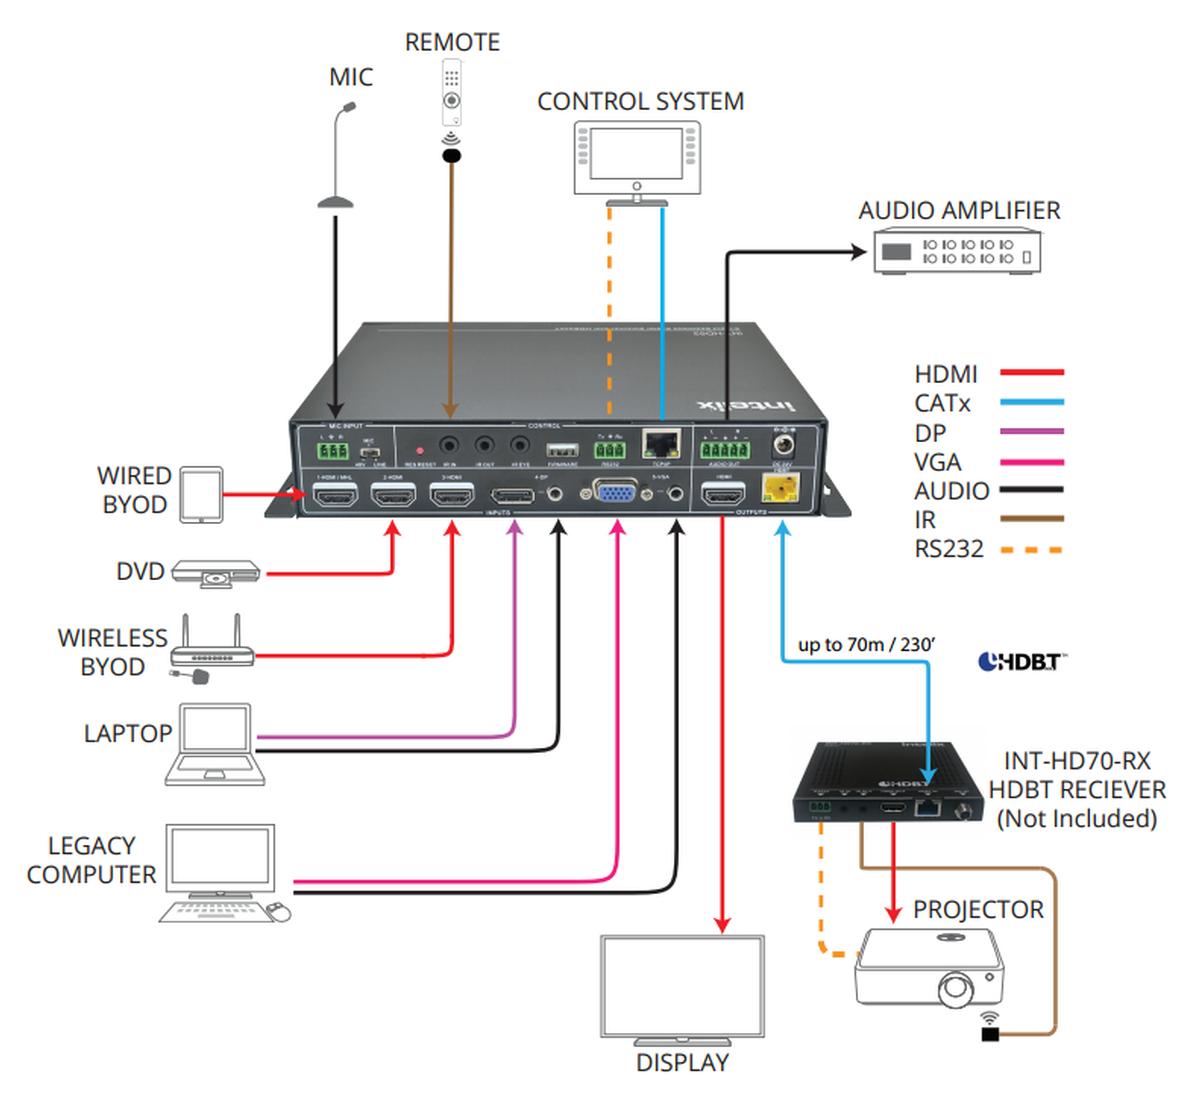 Liberty Av Int Hd52 5x1 Auto Switch Scale Presentation